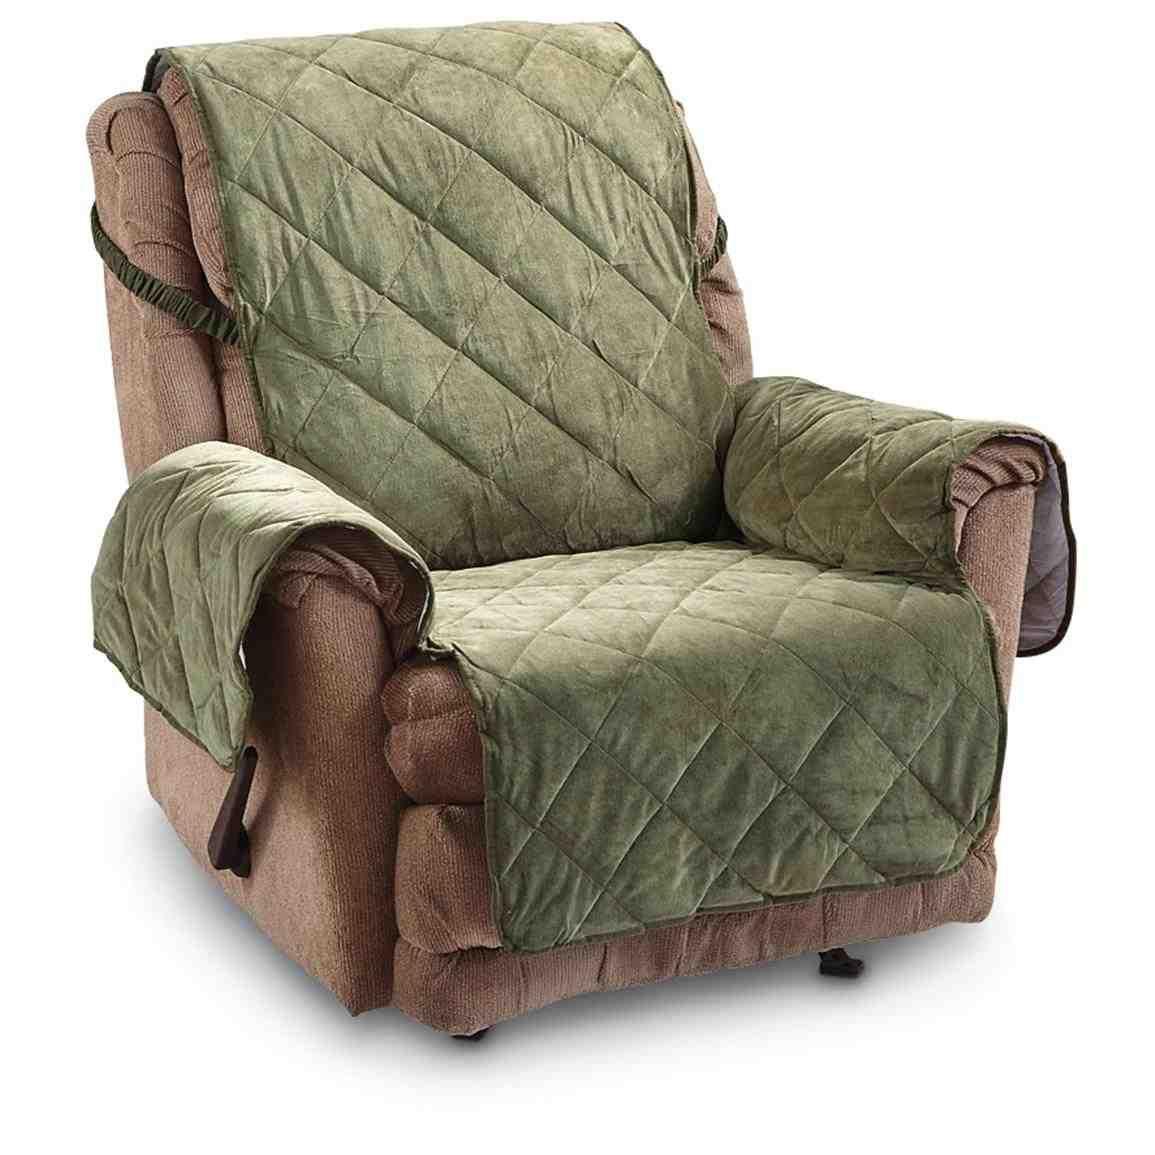 Recliner Covers Make an Old Chair Look New Again - Home Furniture Design  sc 1 st  Pinterest & Recliner Covers: Make an Old Chair Look New Again - Home Furniture ... islam-shia.org